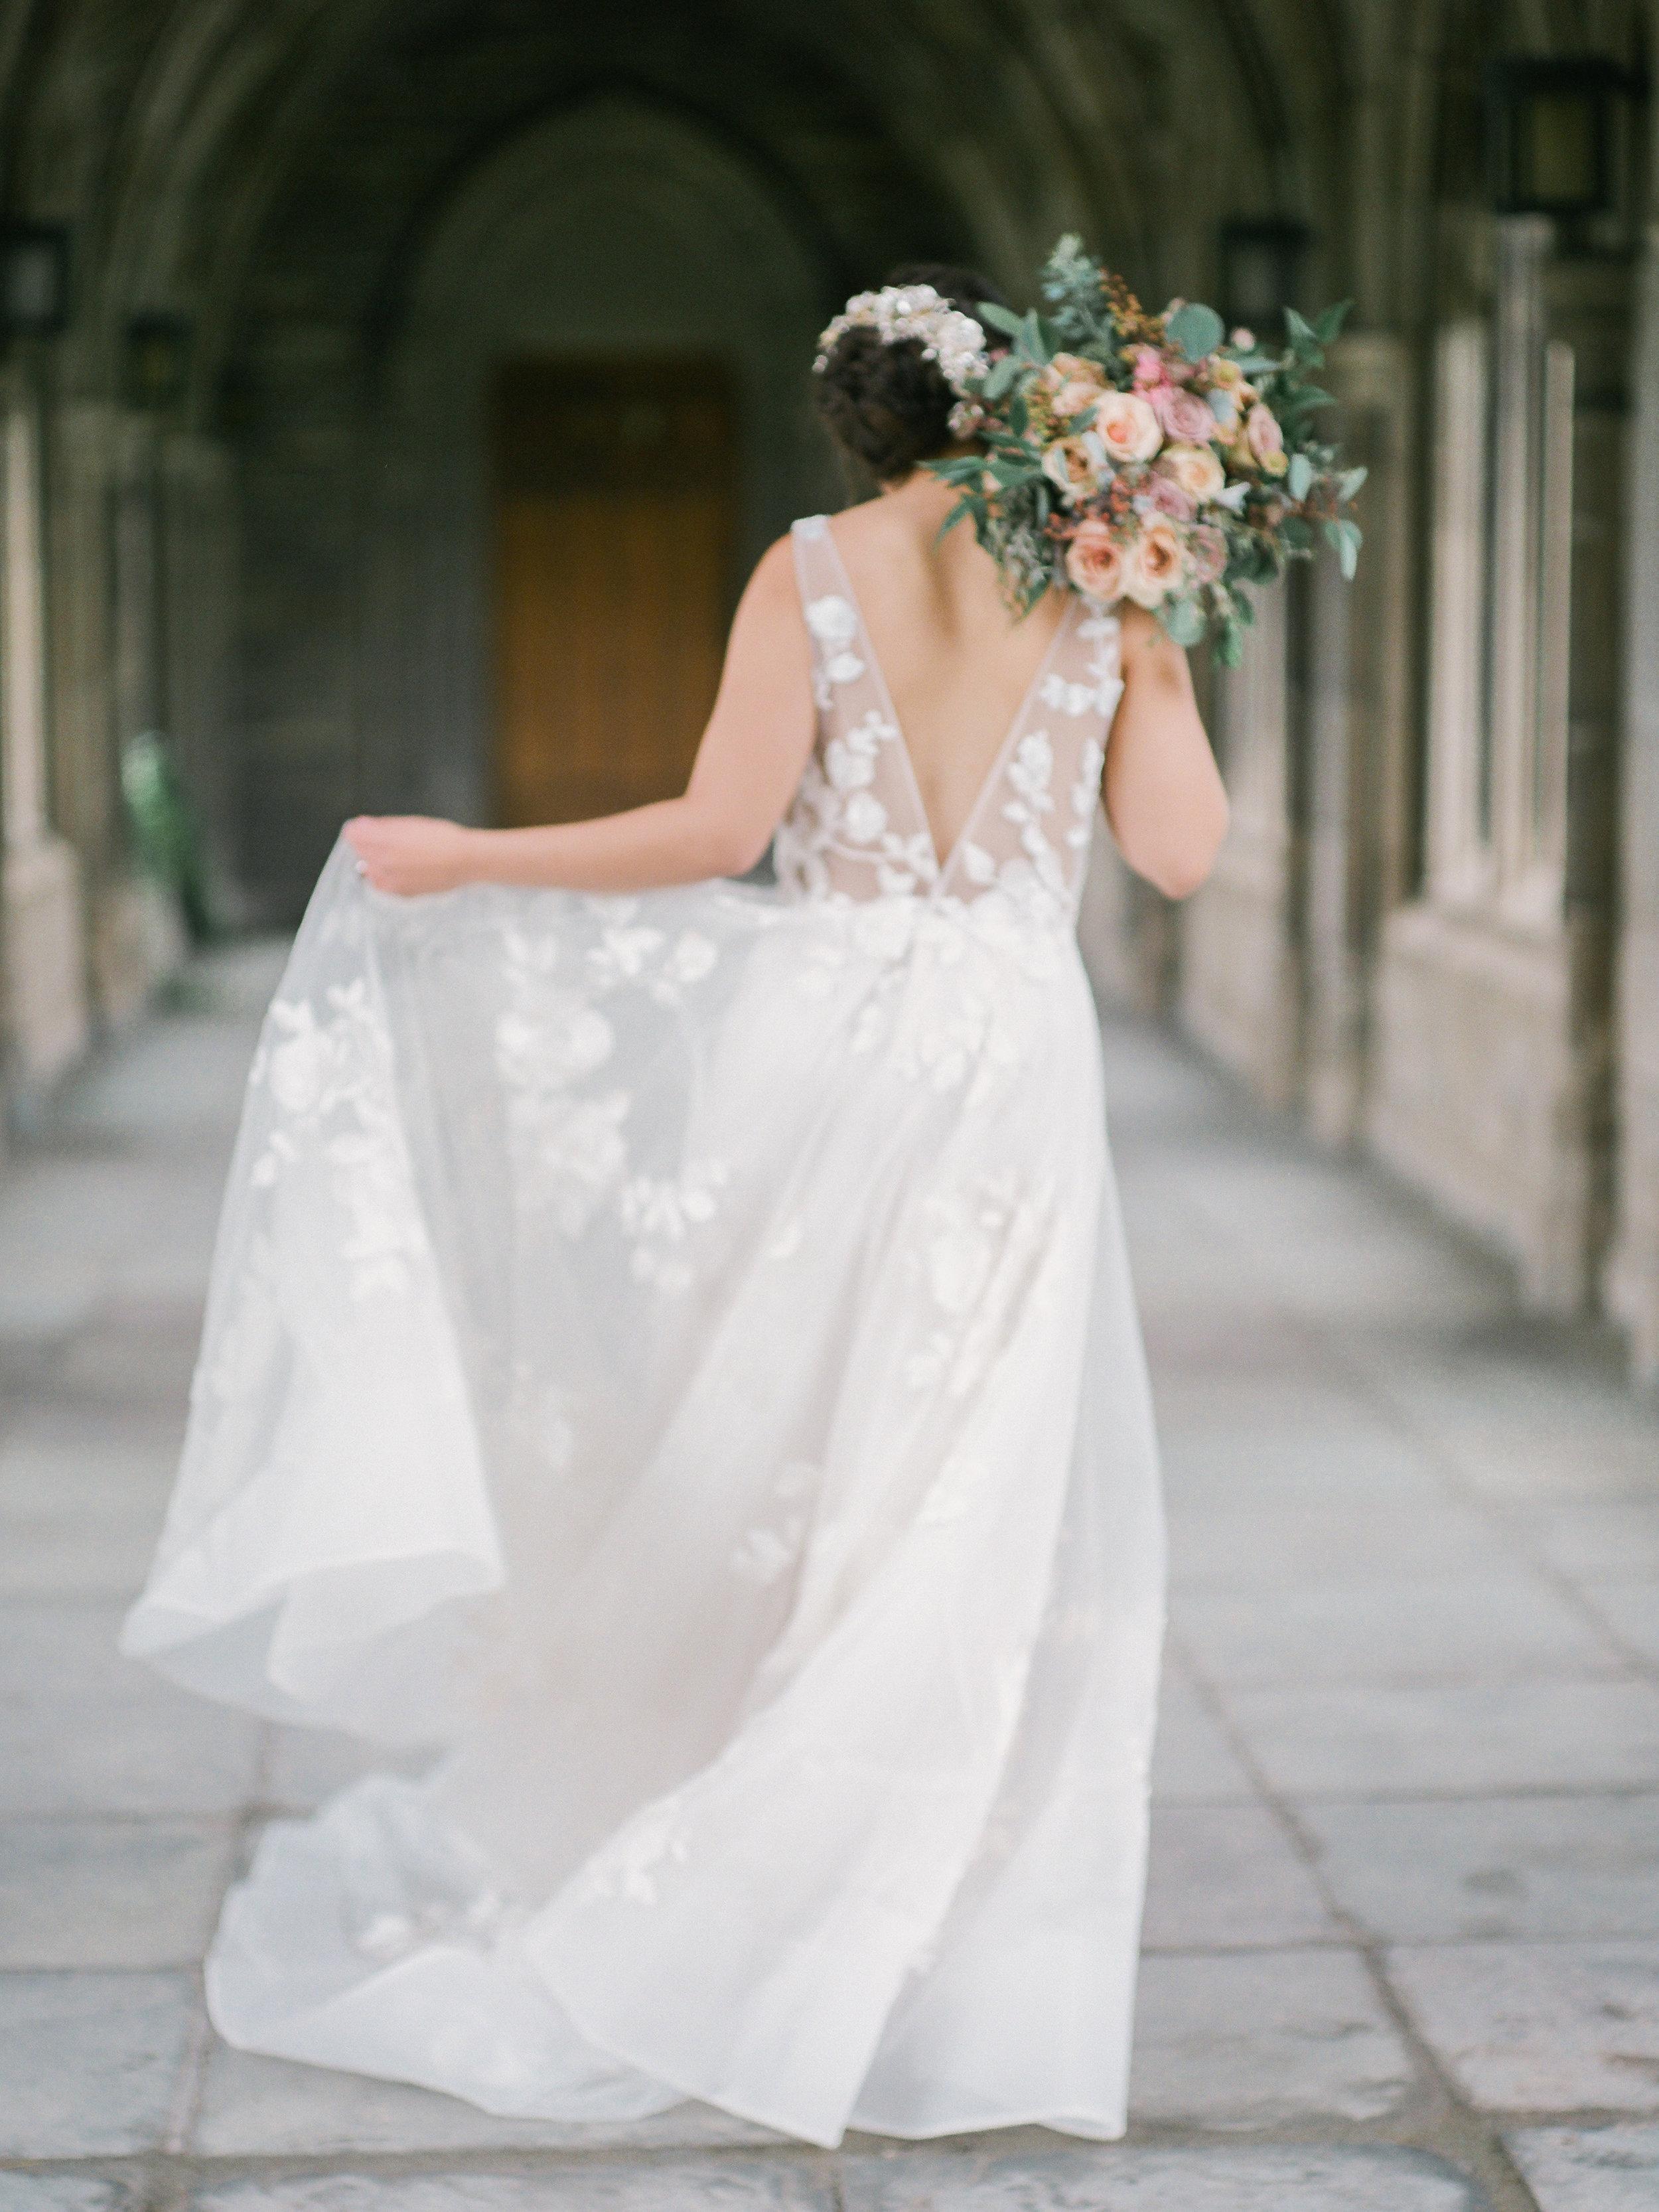 Ithaca New York-Brides Story-Manda Weaver-Wedding-56.jpg